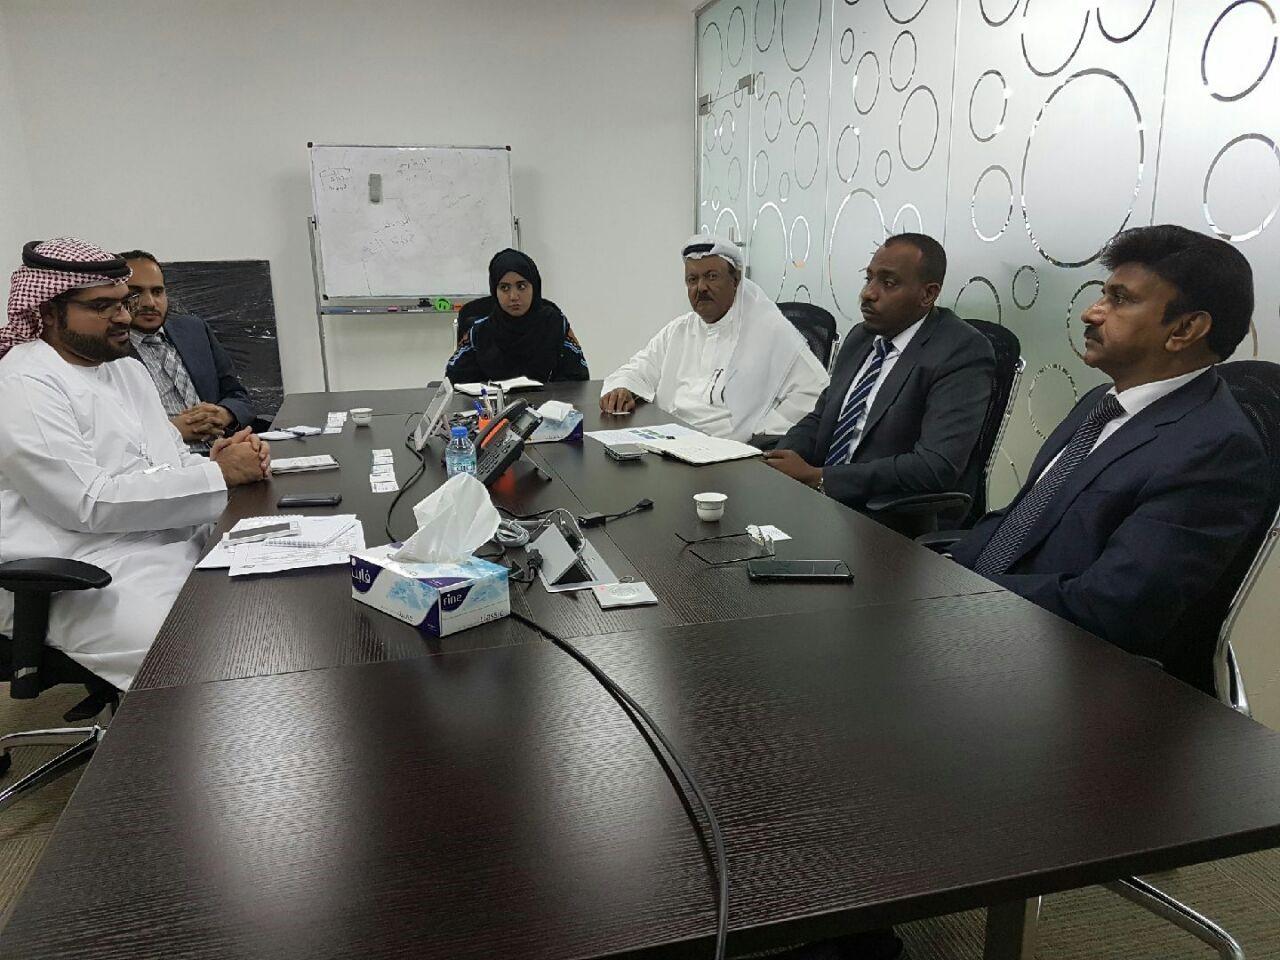 https://www.sharjah.gov.ae//Documents/News/مواصفات.jpg